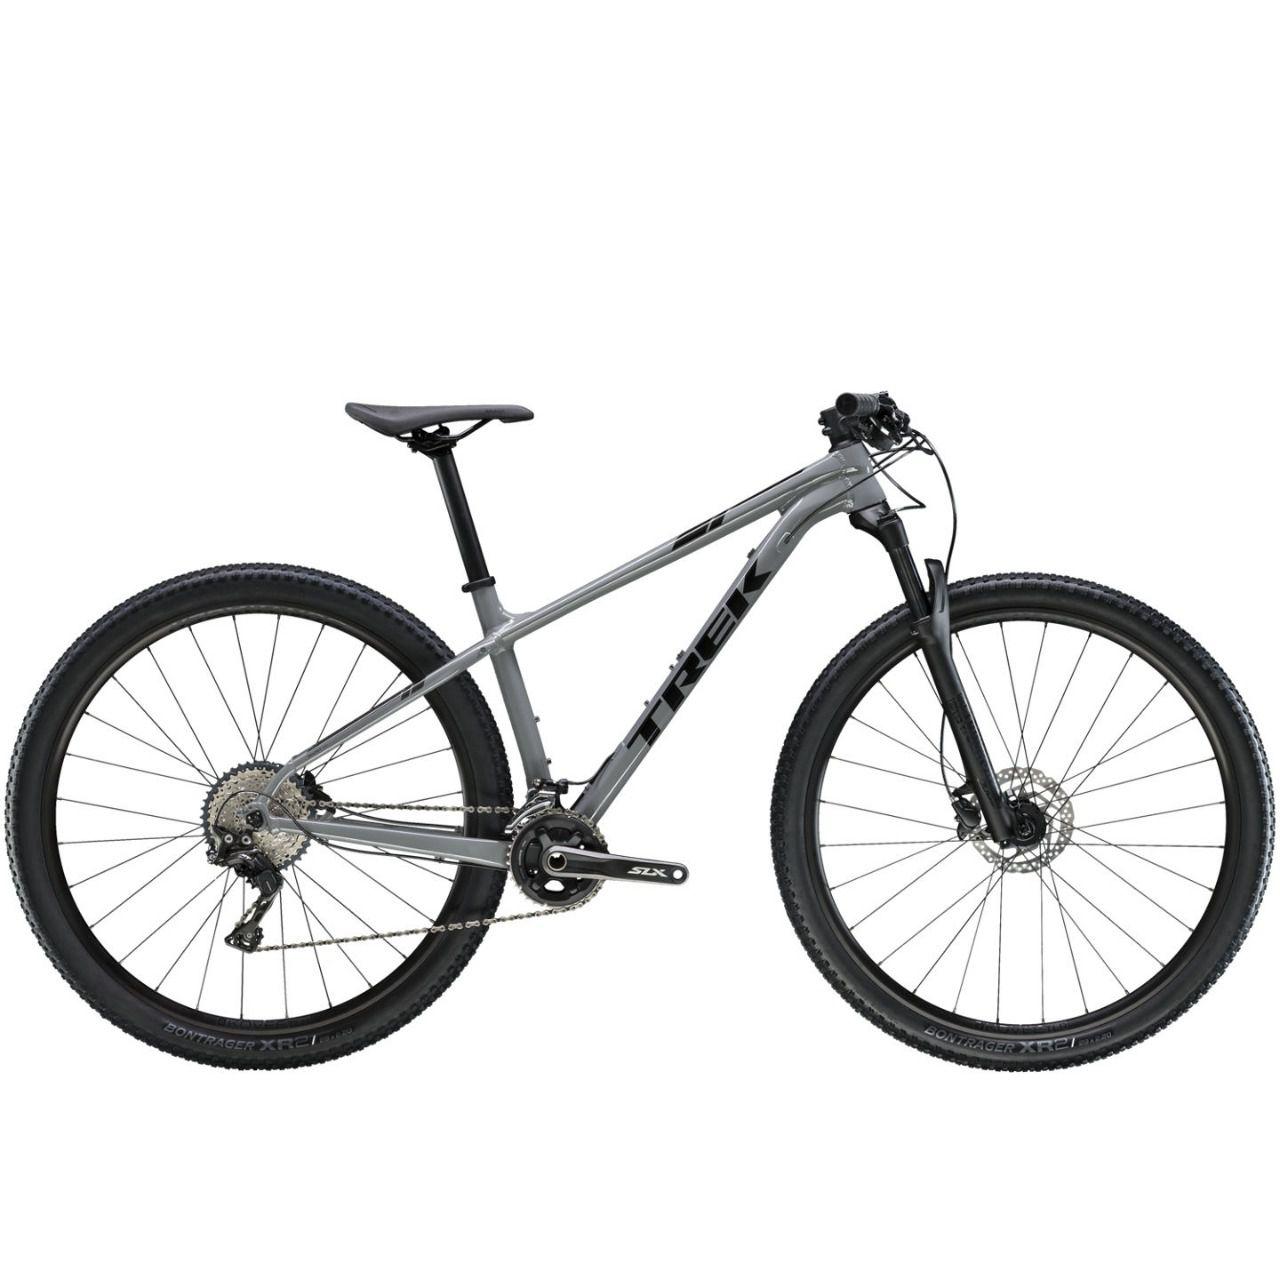 Bicicleta Trek X Caliber 9 - 2019 - R$9350,00